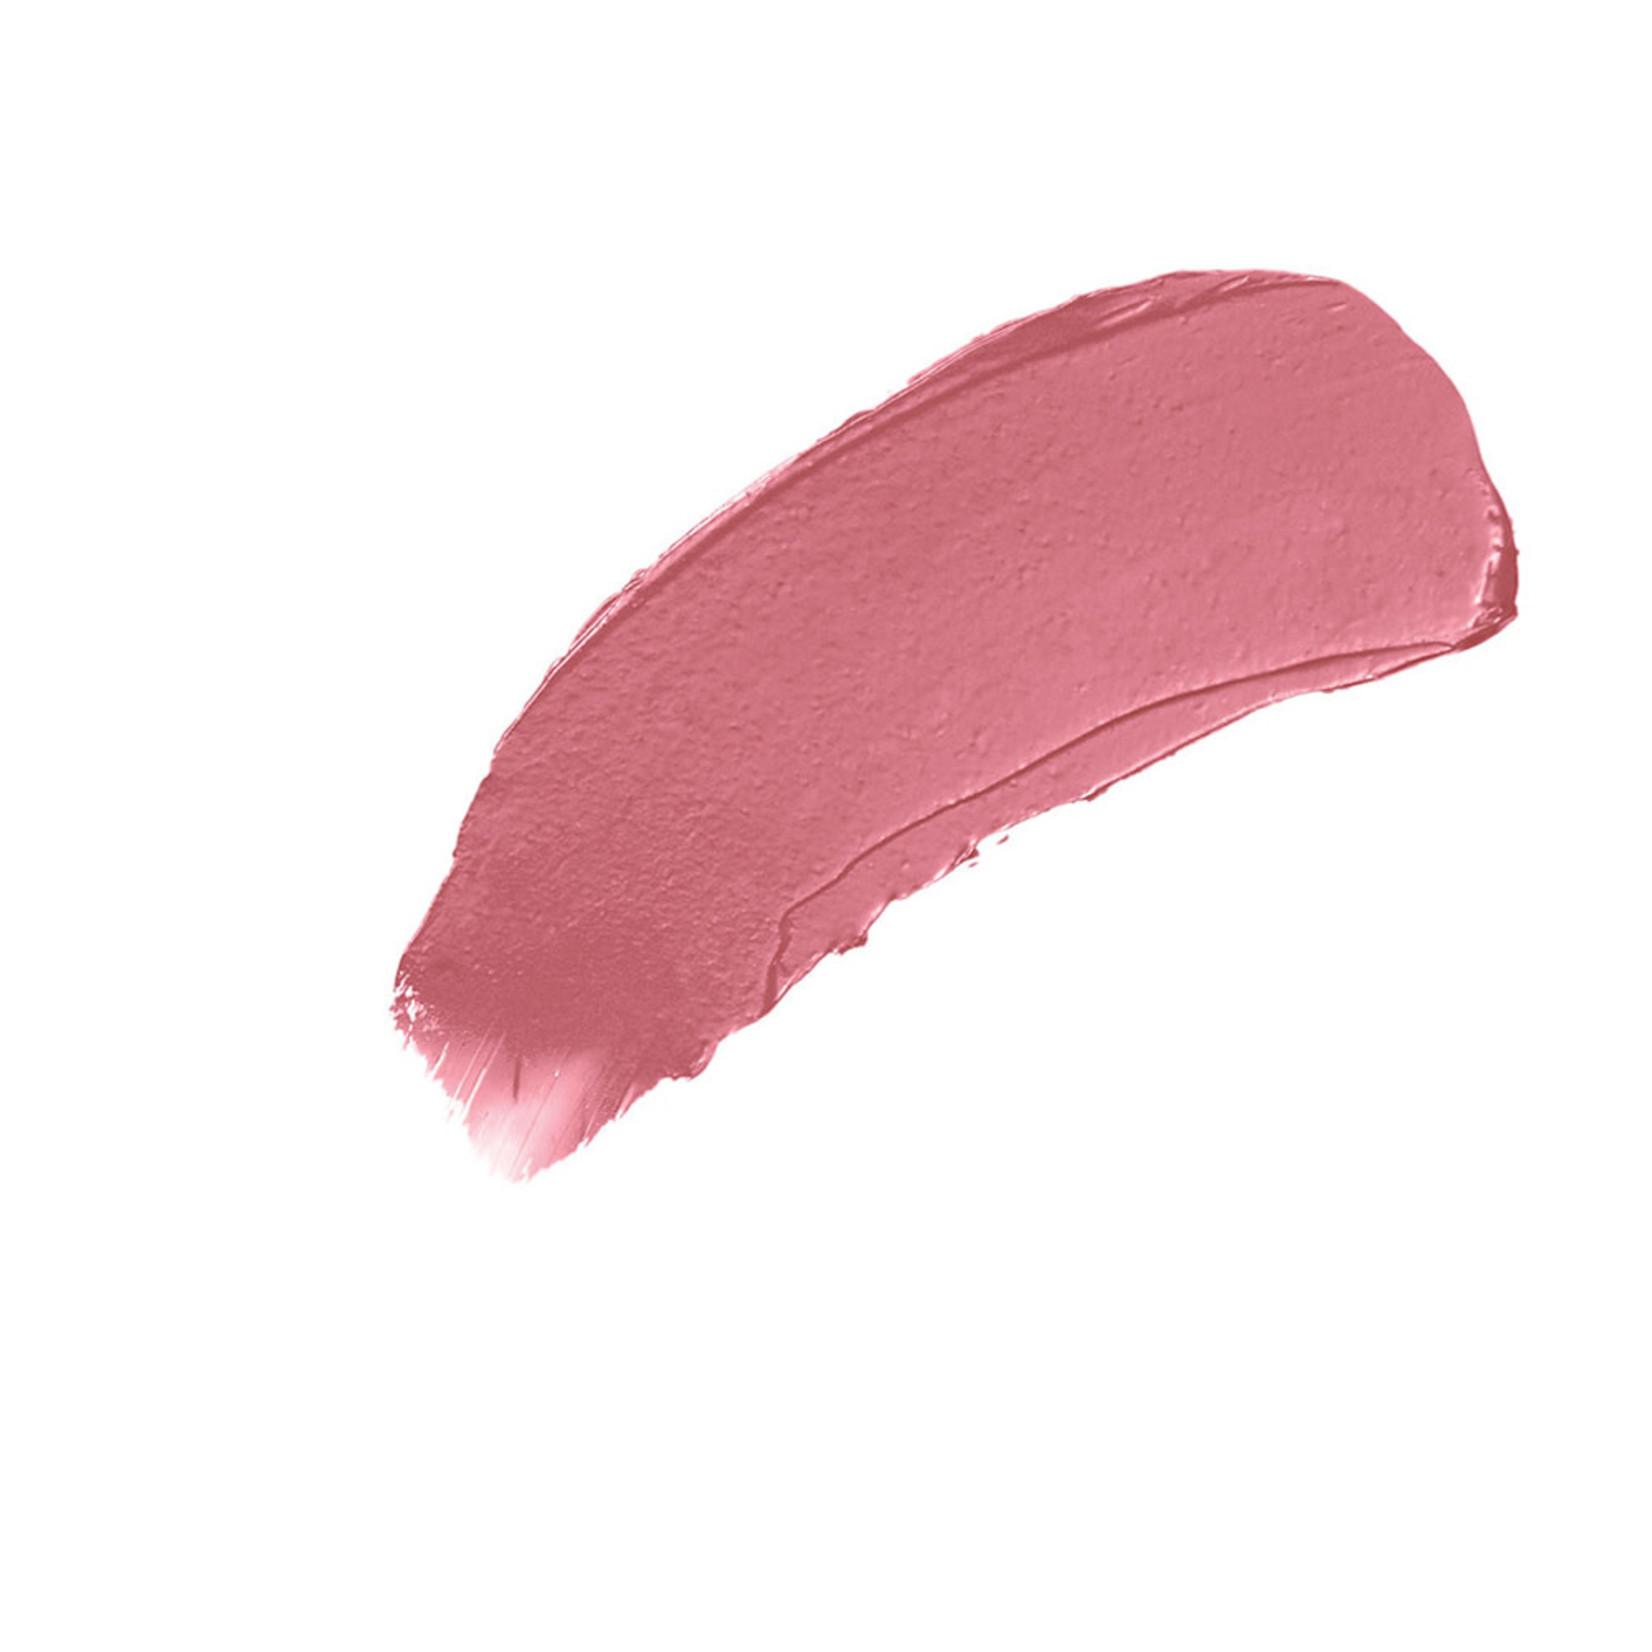 Triple luxe lipstick tania